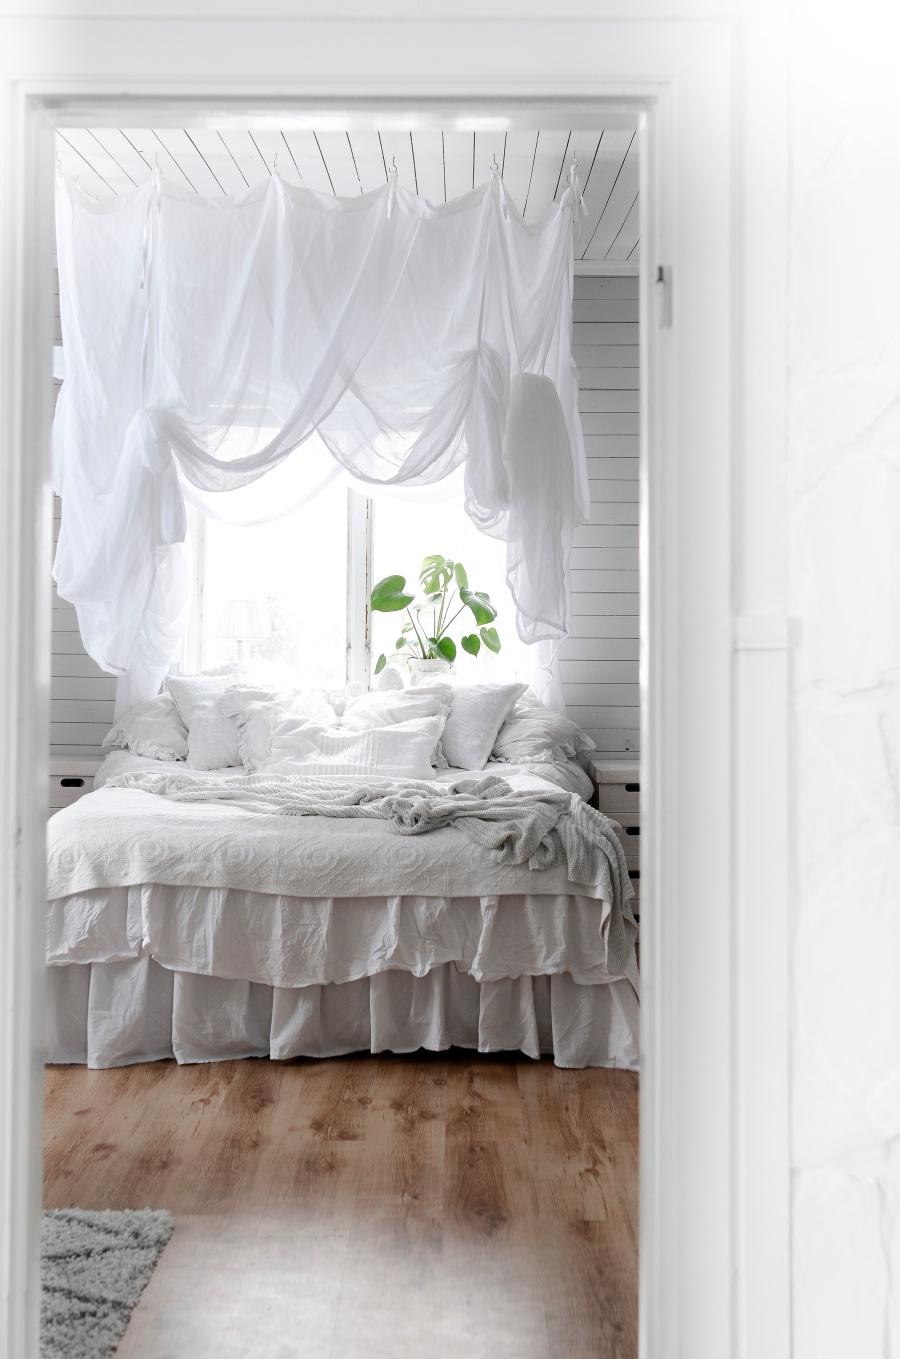 sovrum, renovering, sänghimmel, ellos, boho interior, monstera sovrummet, bedroom, kalklitir, san saccaria